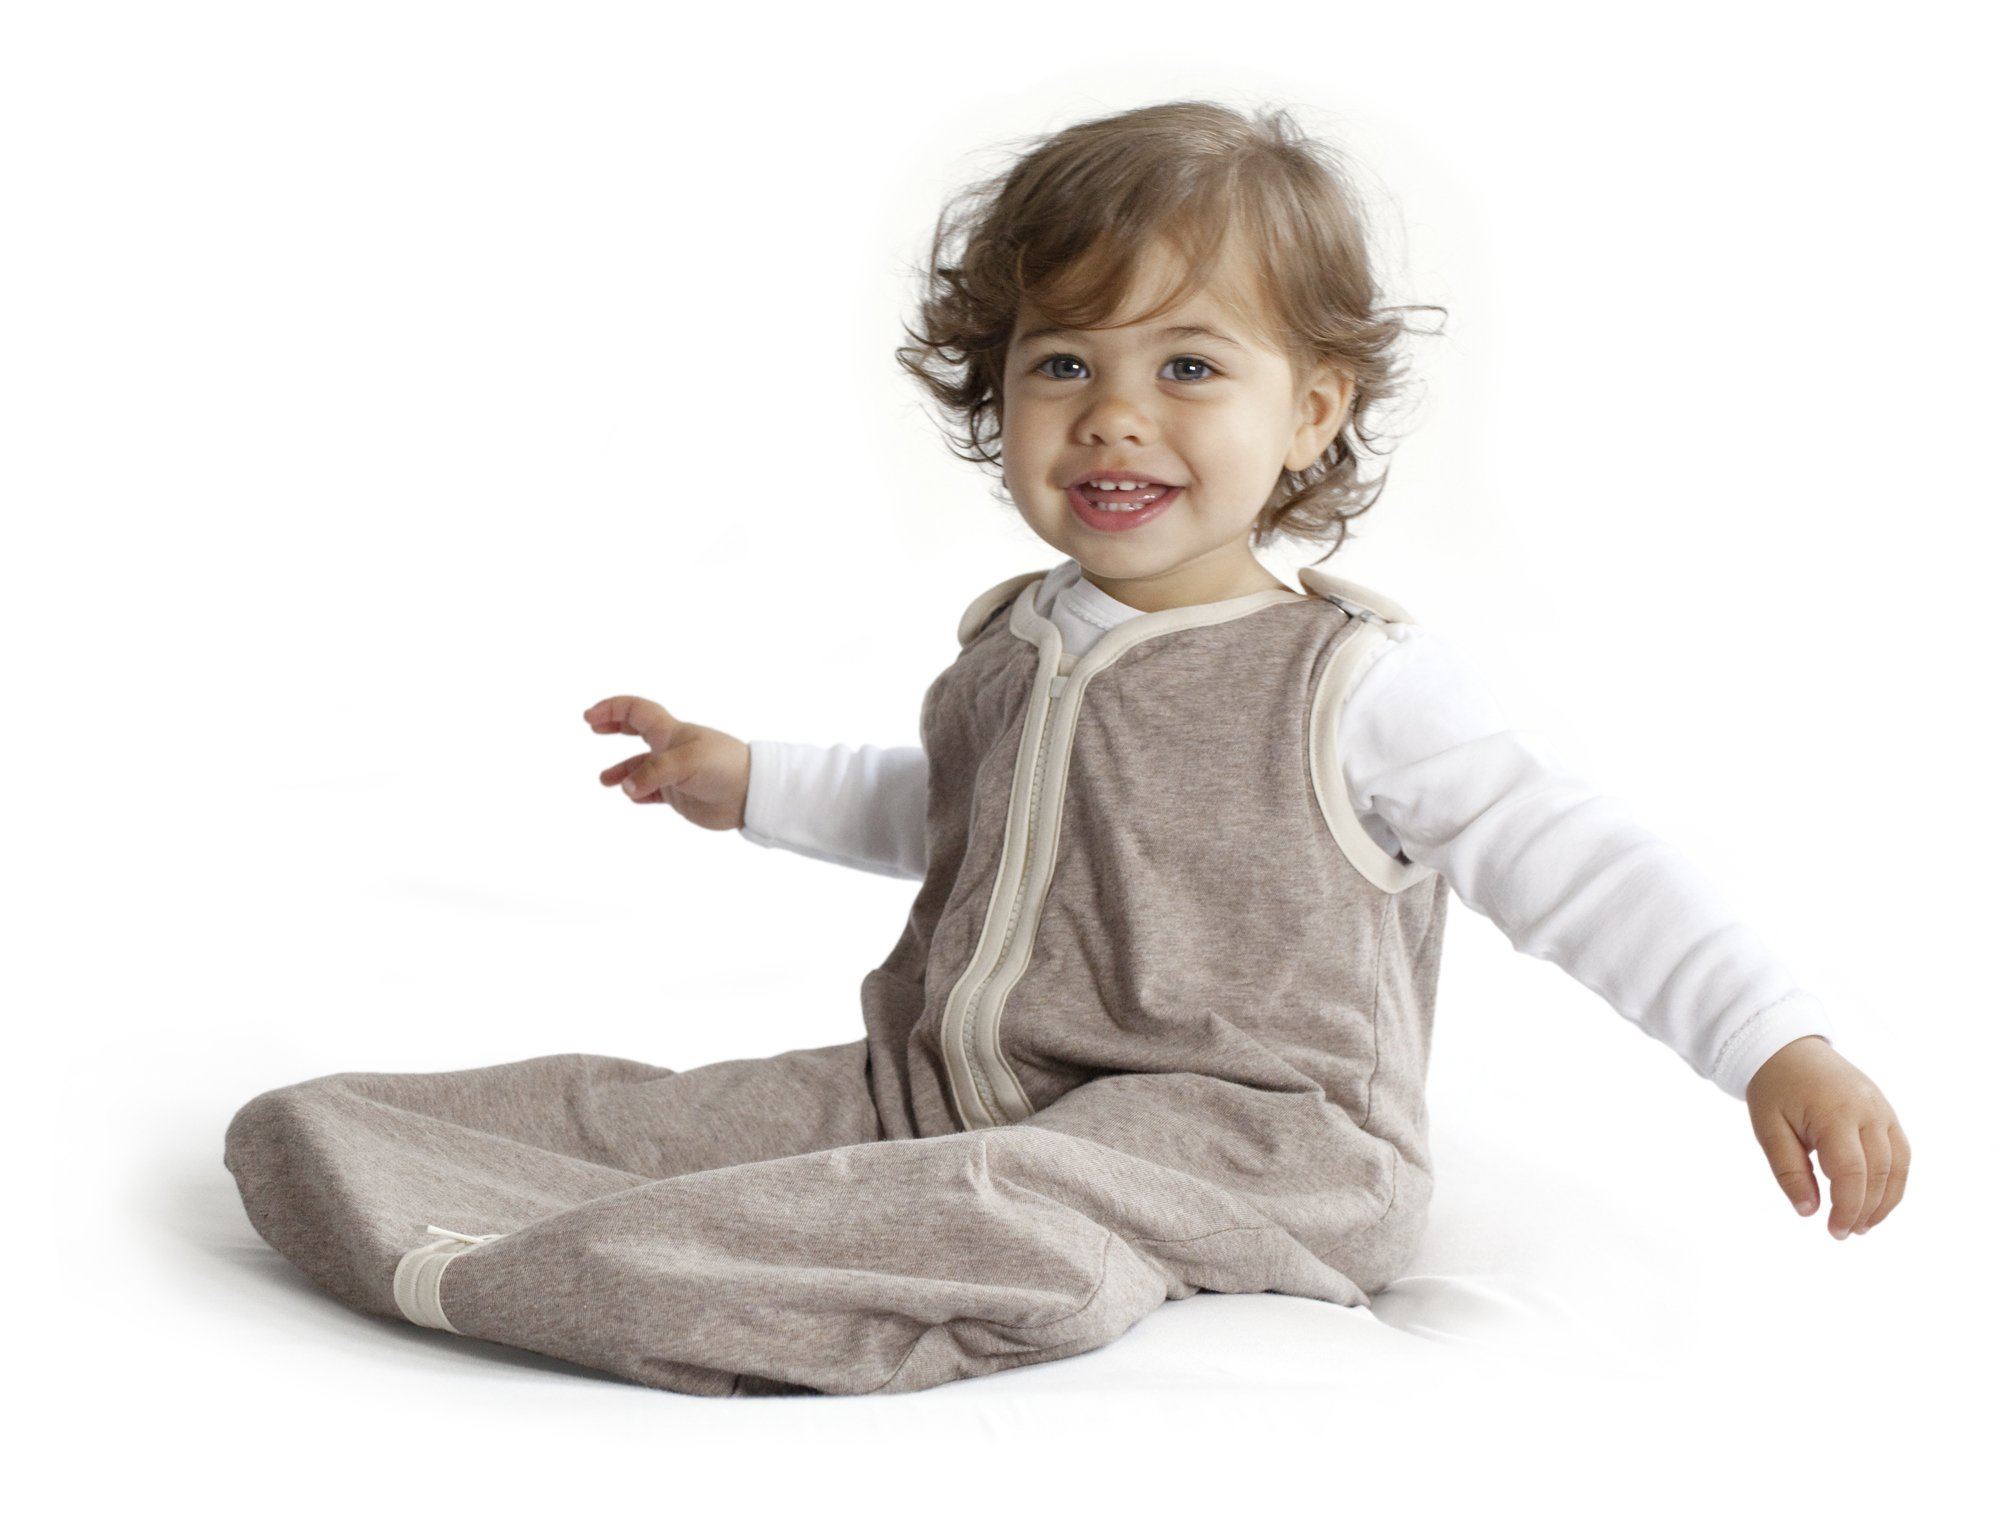 baby deedee Sleep Nest Lite, Sleeping Bag Sack - Mocha Heather, L (18-36 Months) by baby deedee